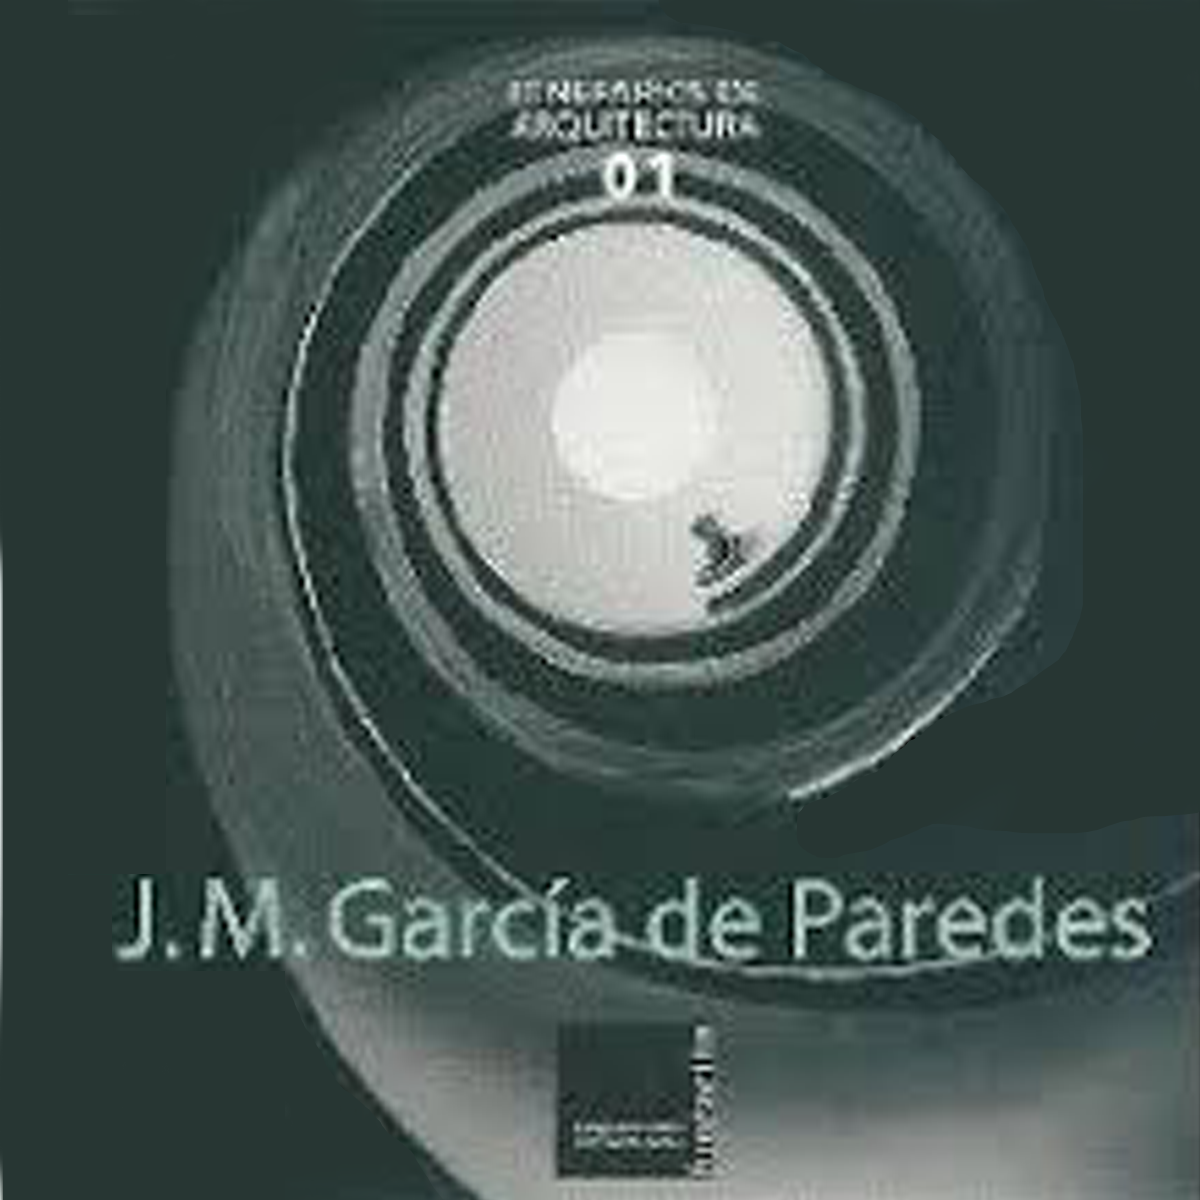 J. M. García de Paredes